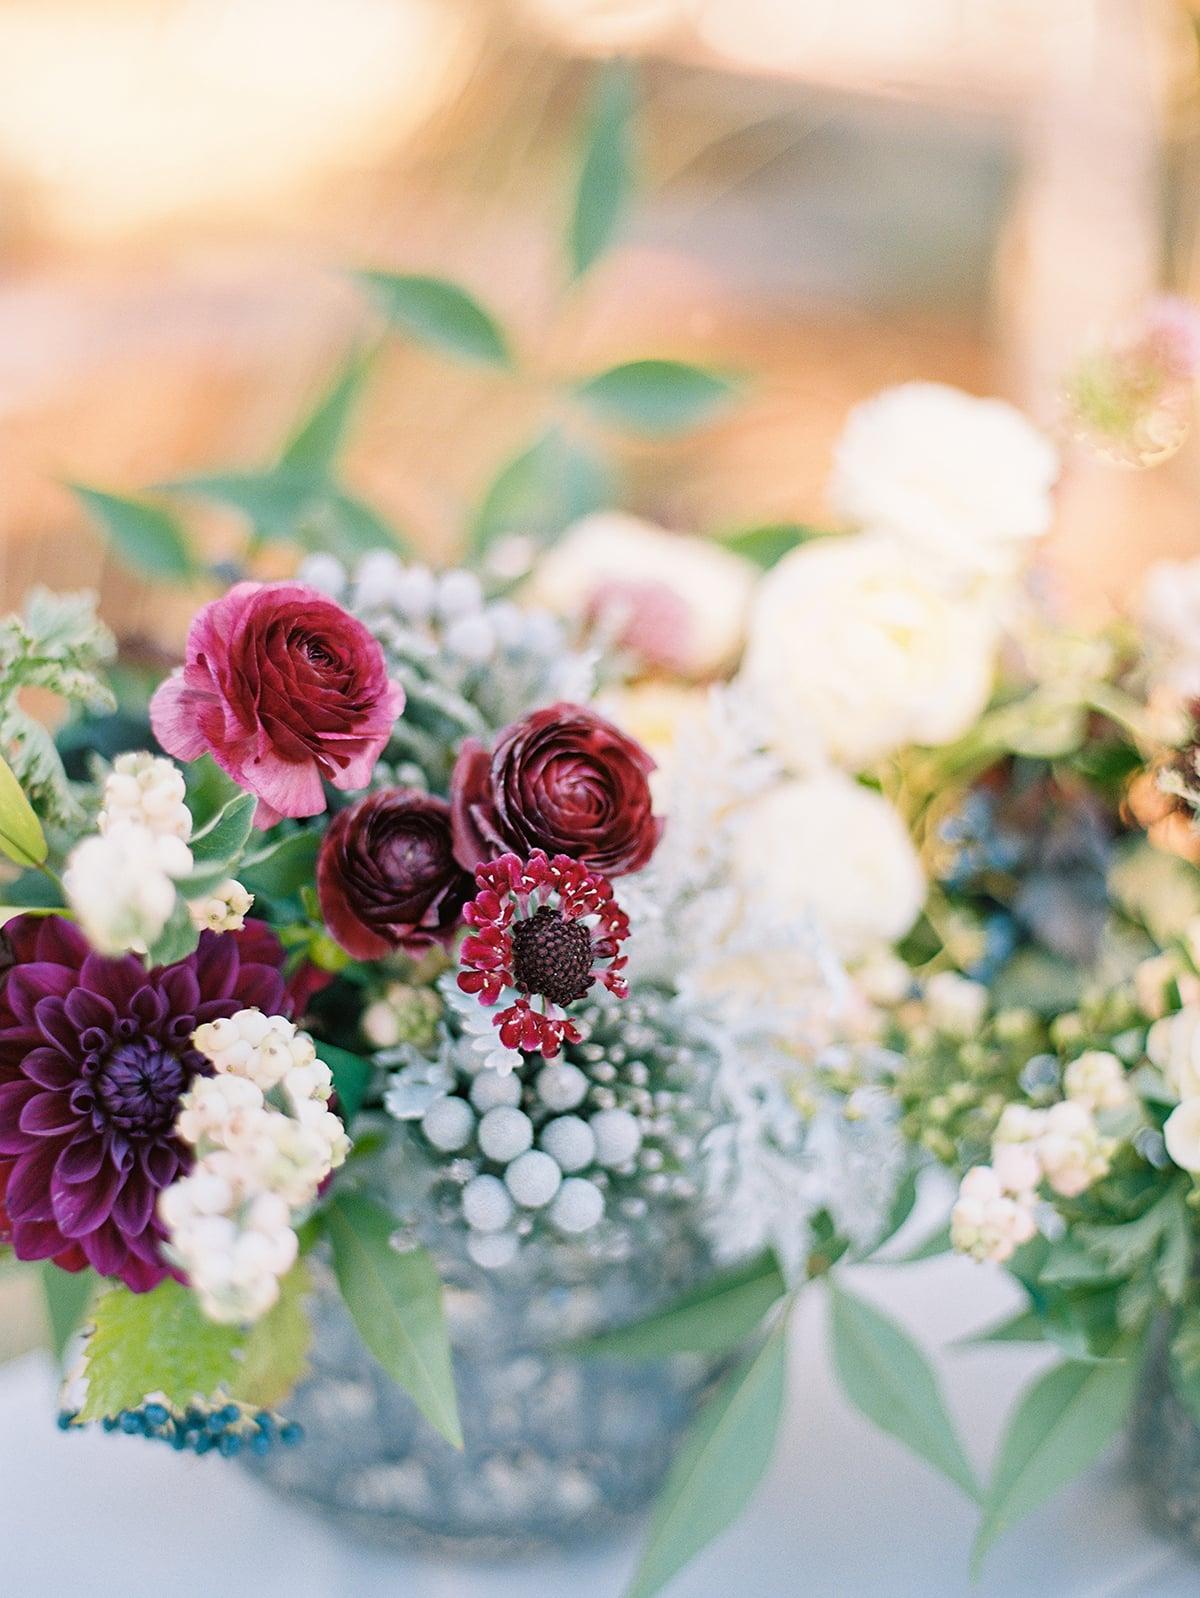 Heirloom Floral Design - Sisters Oregon - 1.jpg